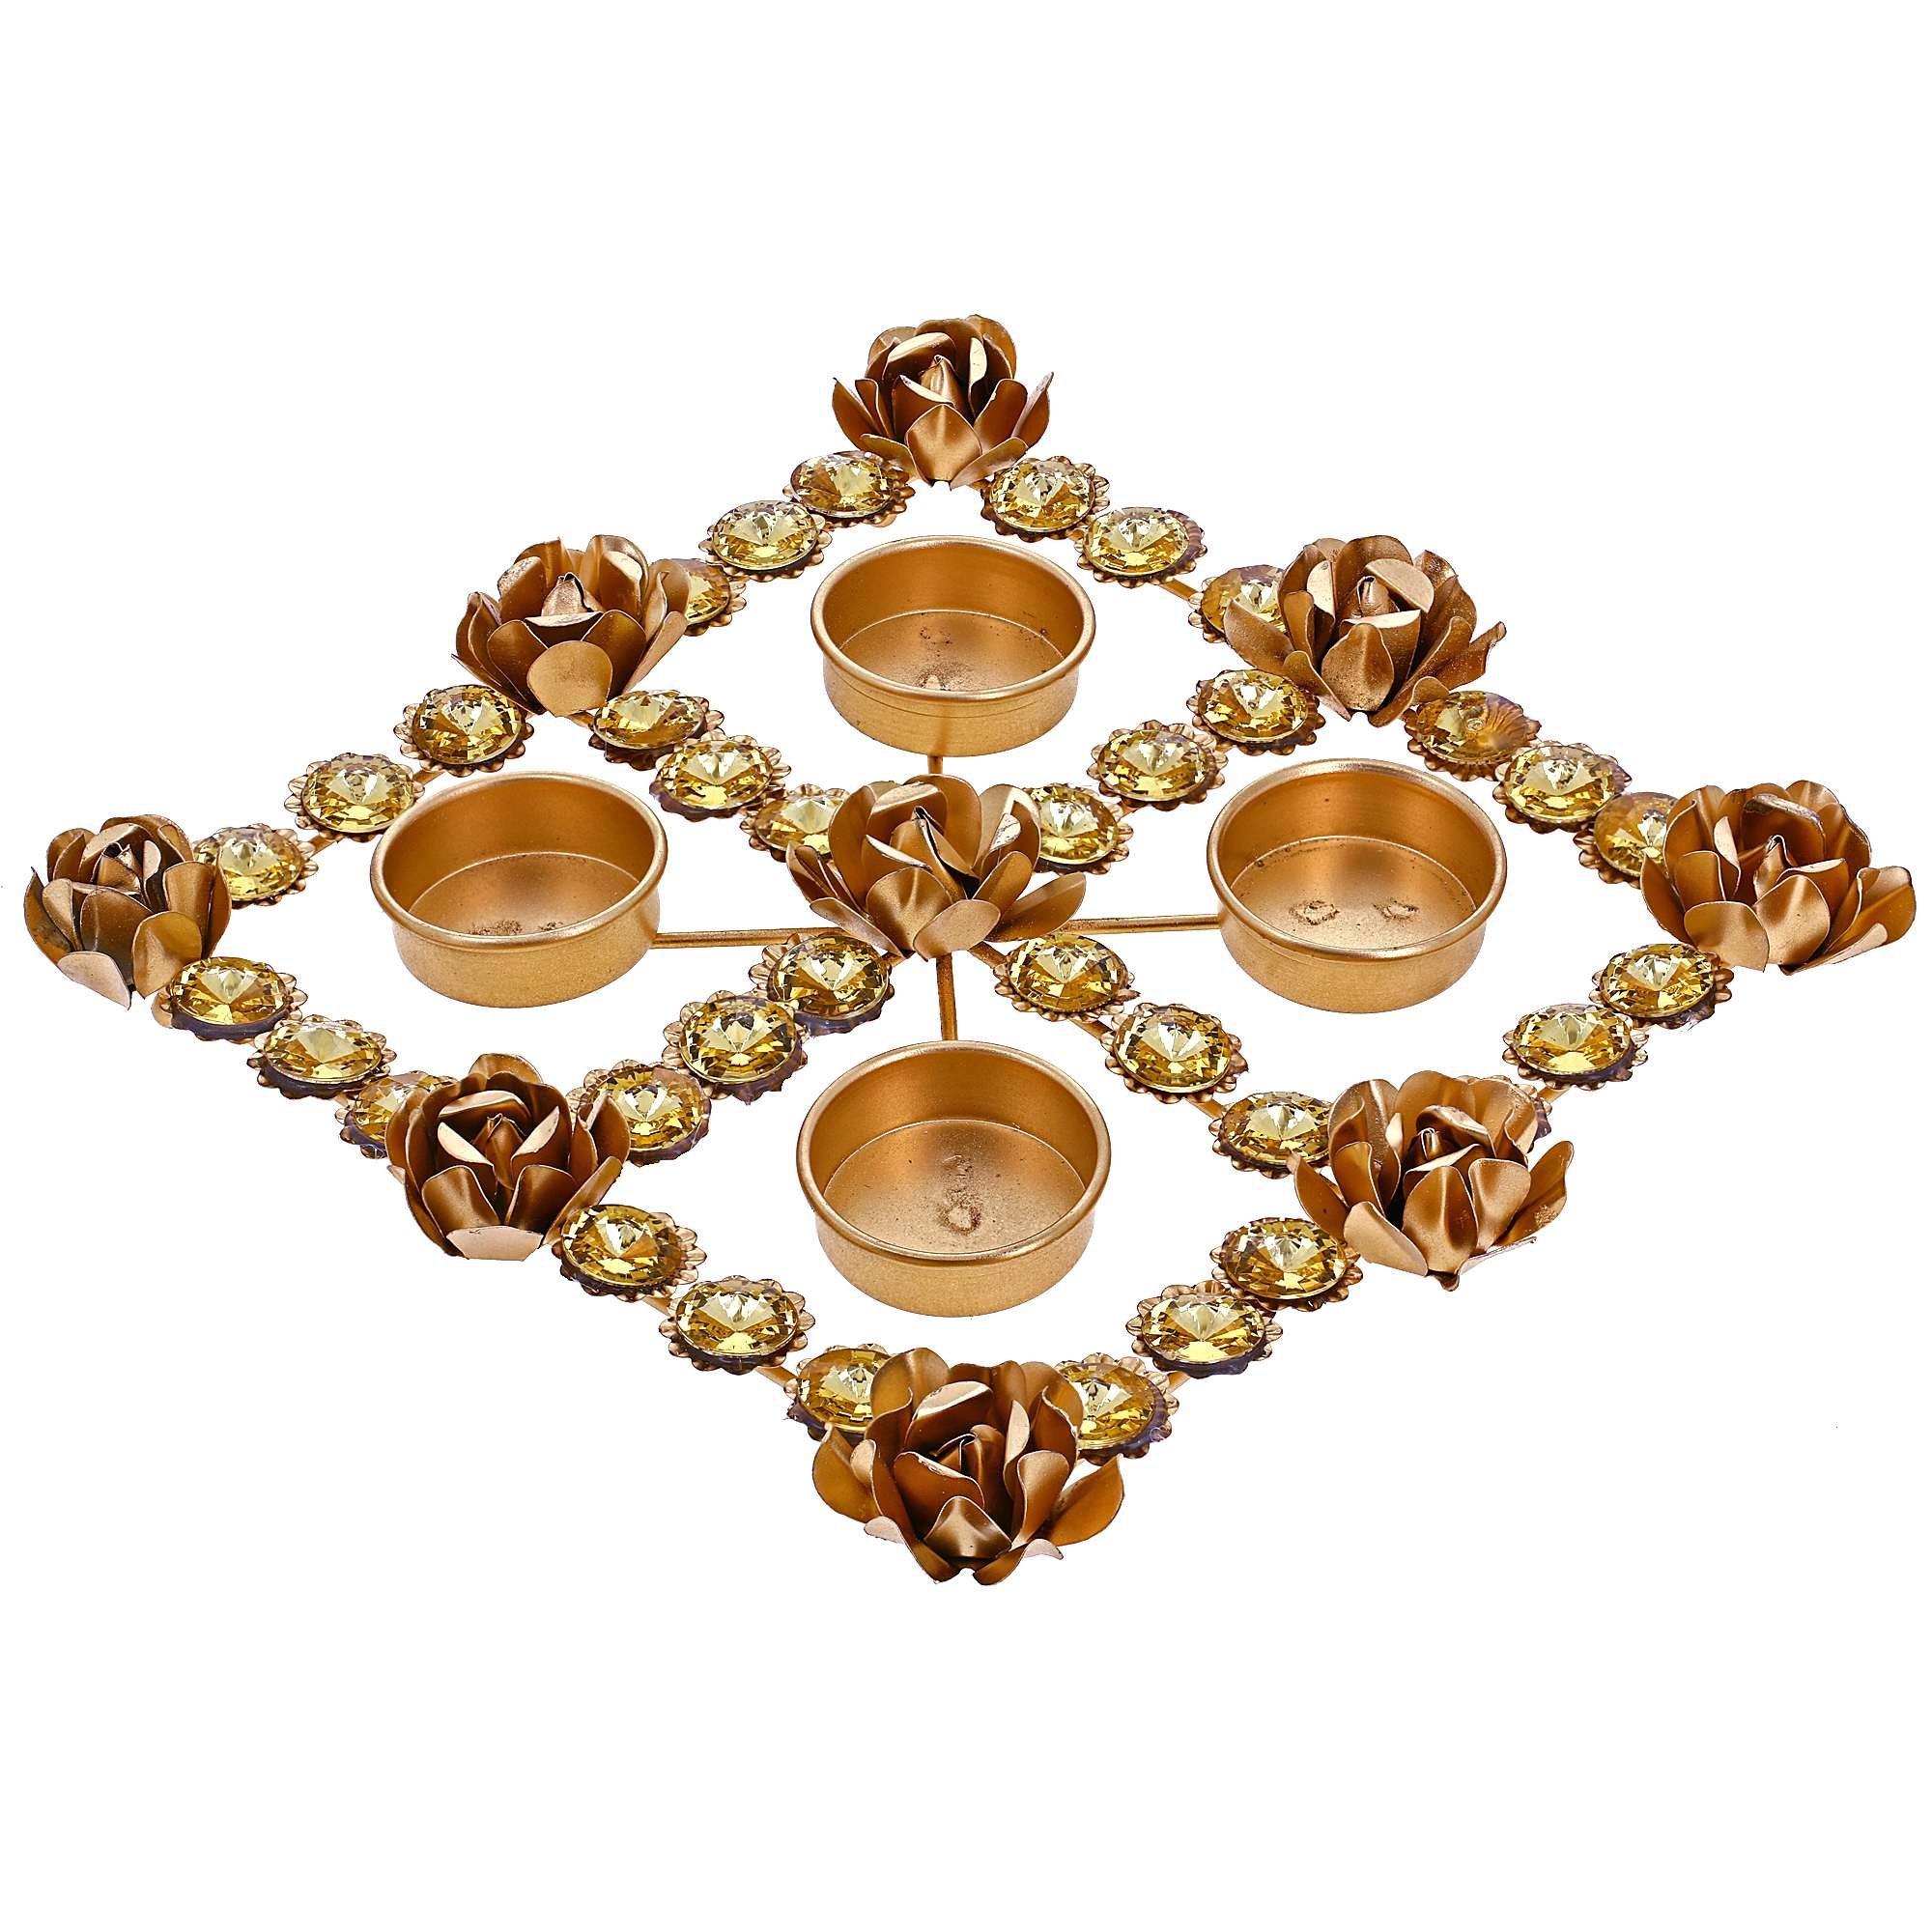 ShalinIndia Beautiful Diya Christmas Rangoli Decorations & Puja -Perfect for Everyday Decor- Lovely Gift Idea for Any Occasion